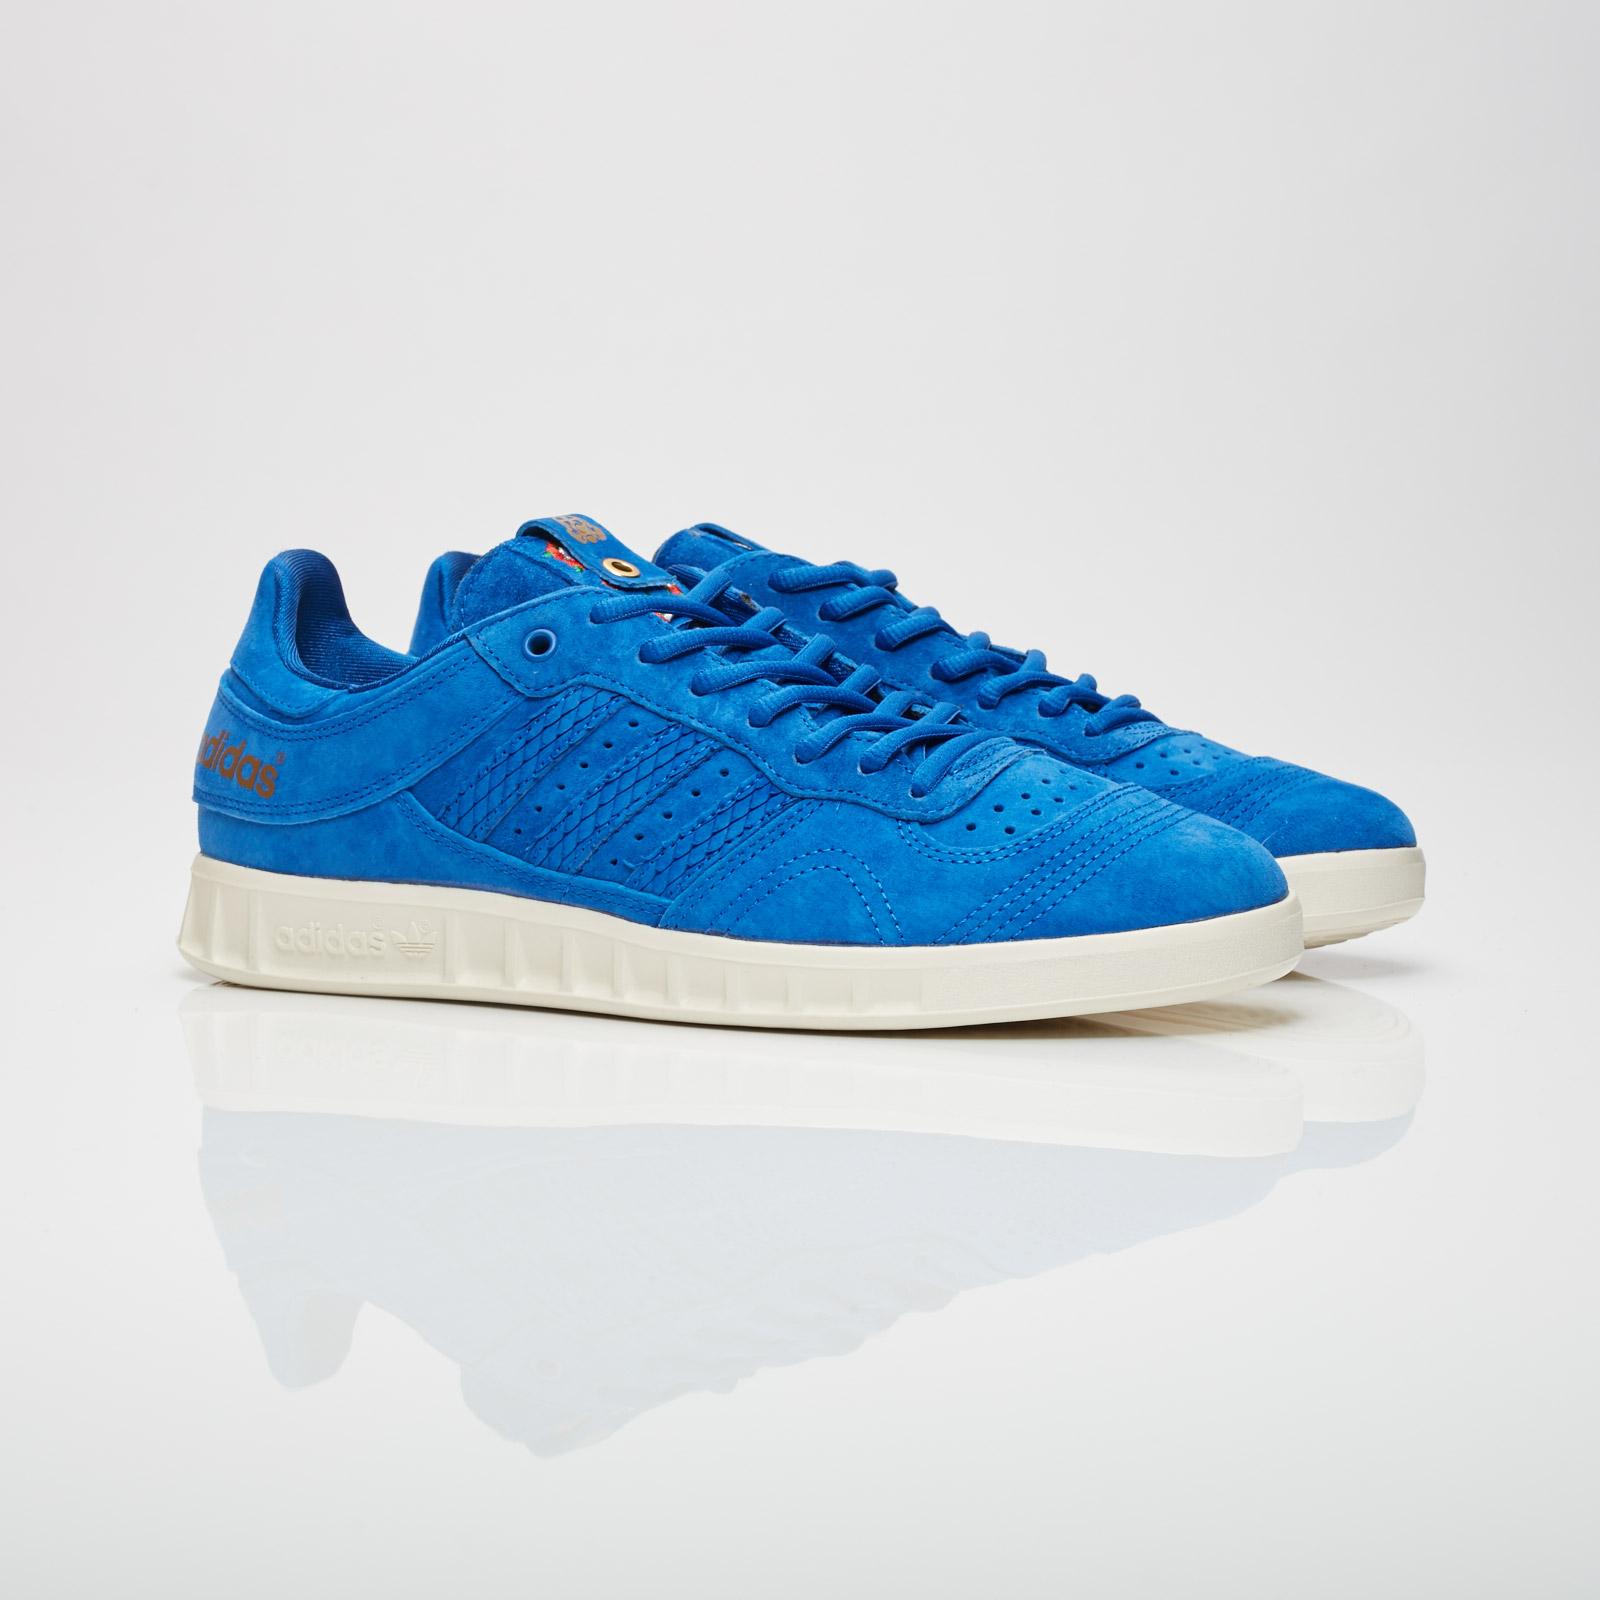 premium selection d78b4 5e8a5 adidas Consortium Handball Top Footpatrol x Juice